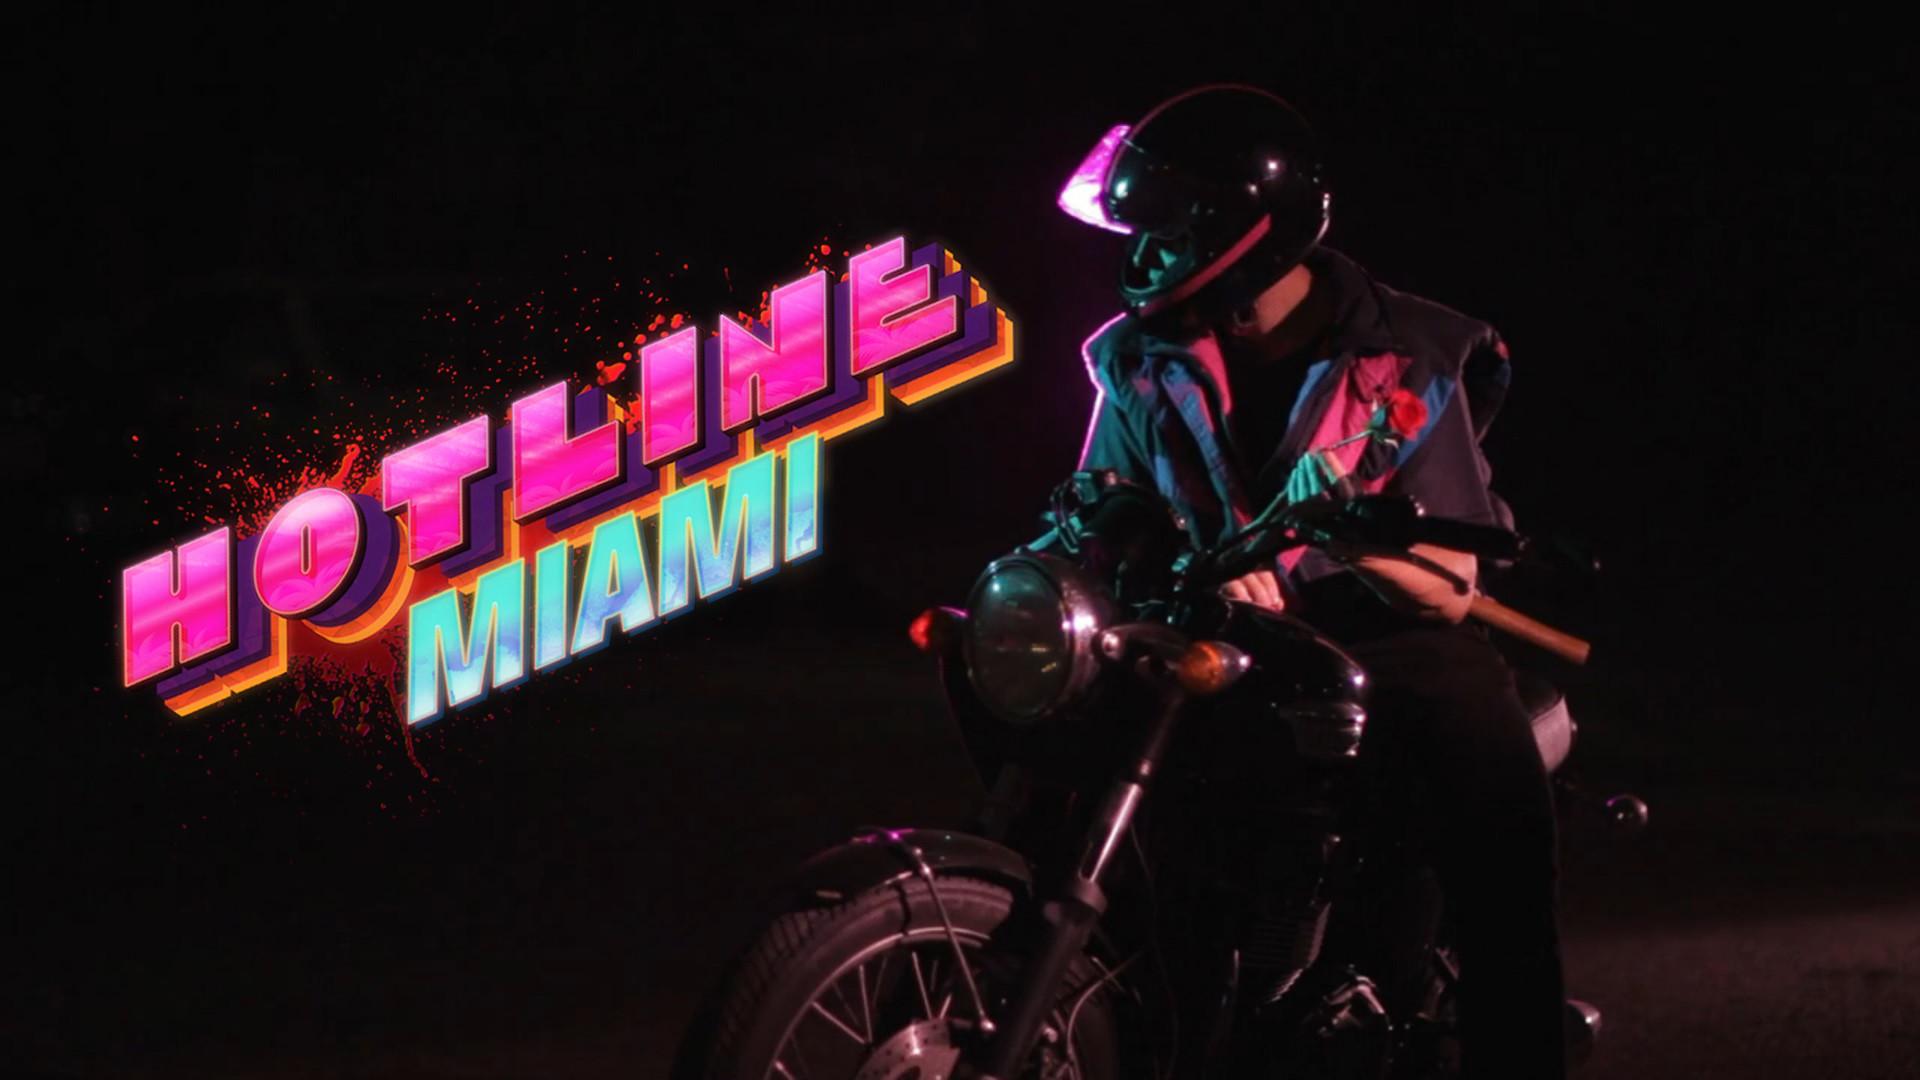 Hotline Miami 2: Wrong Number 34 High Resolution Wallpaper Wallpaper